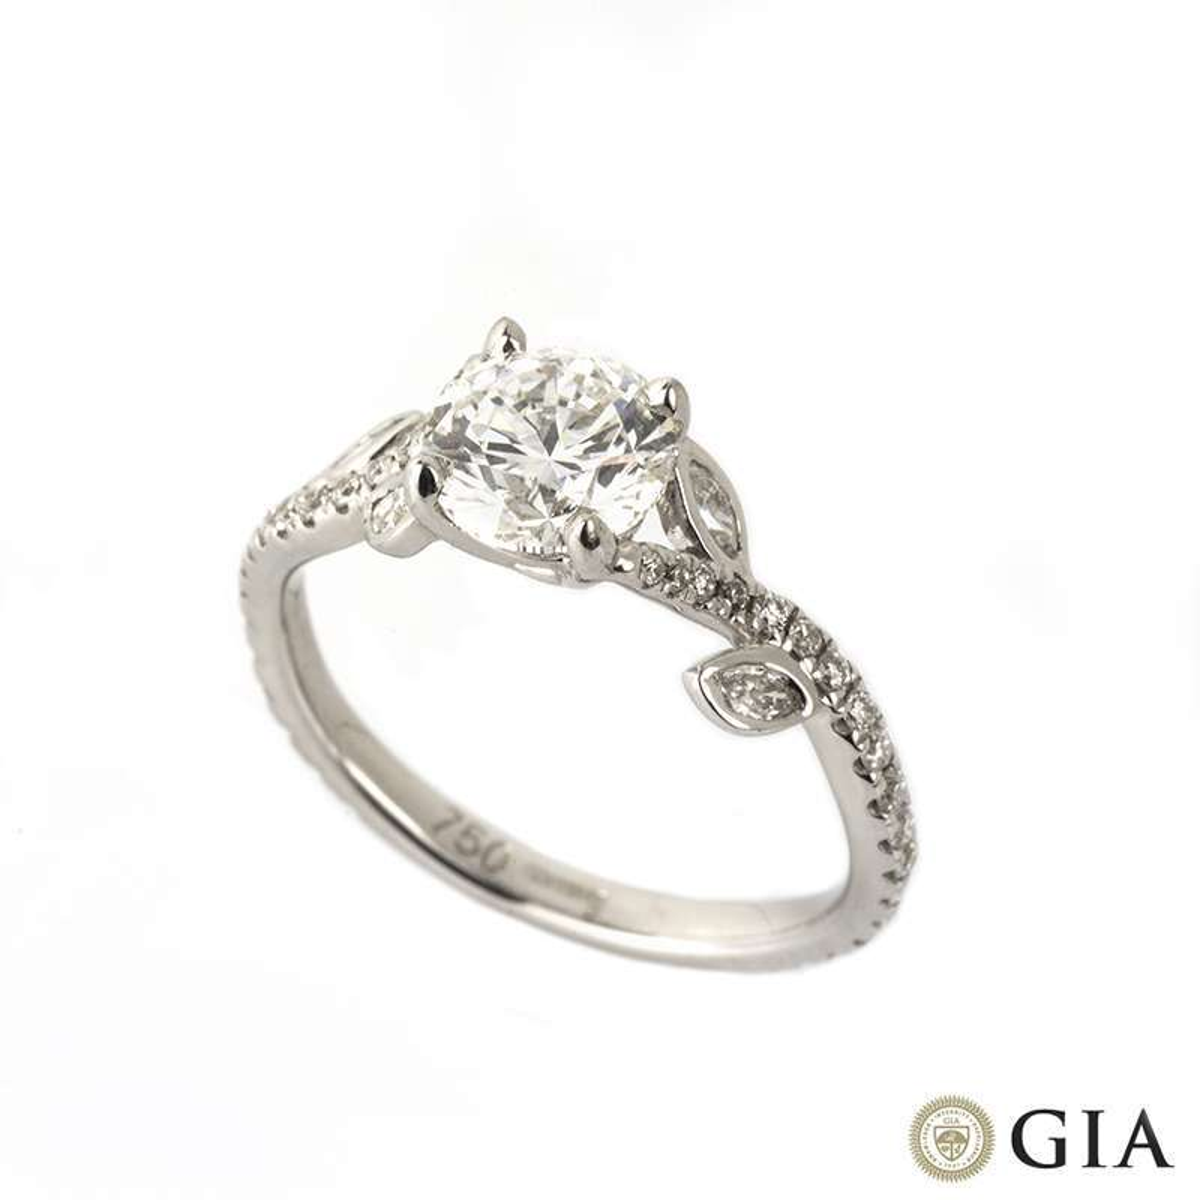 White Gold Round Brilliant Cut Diamond Ring 1.01ct E/VVS1